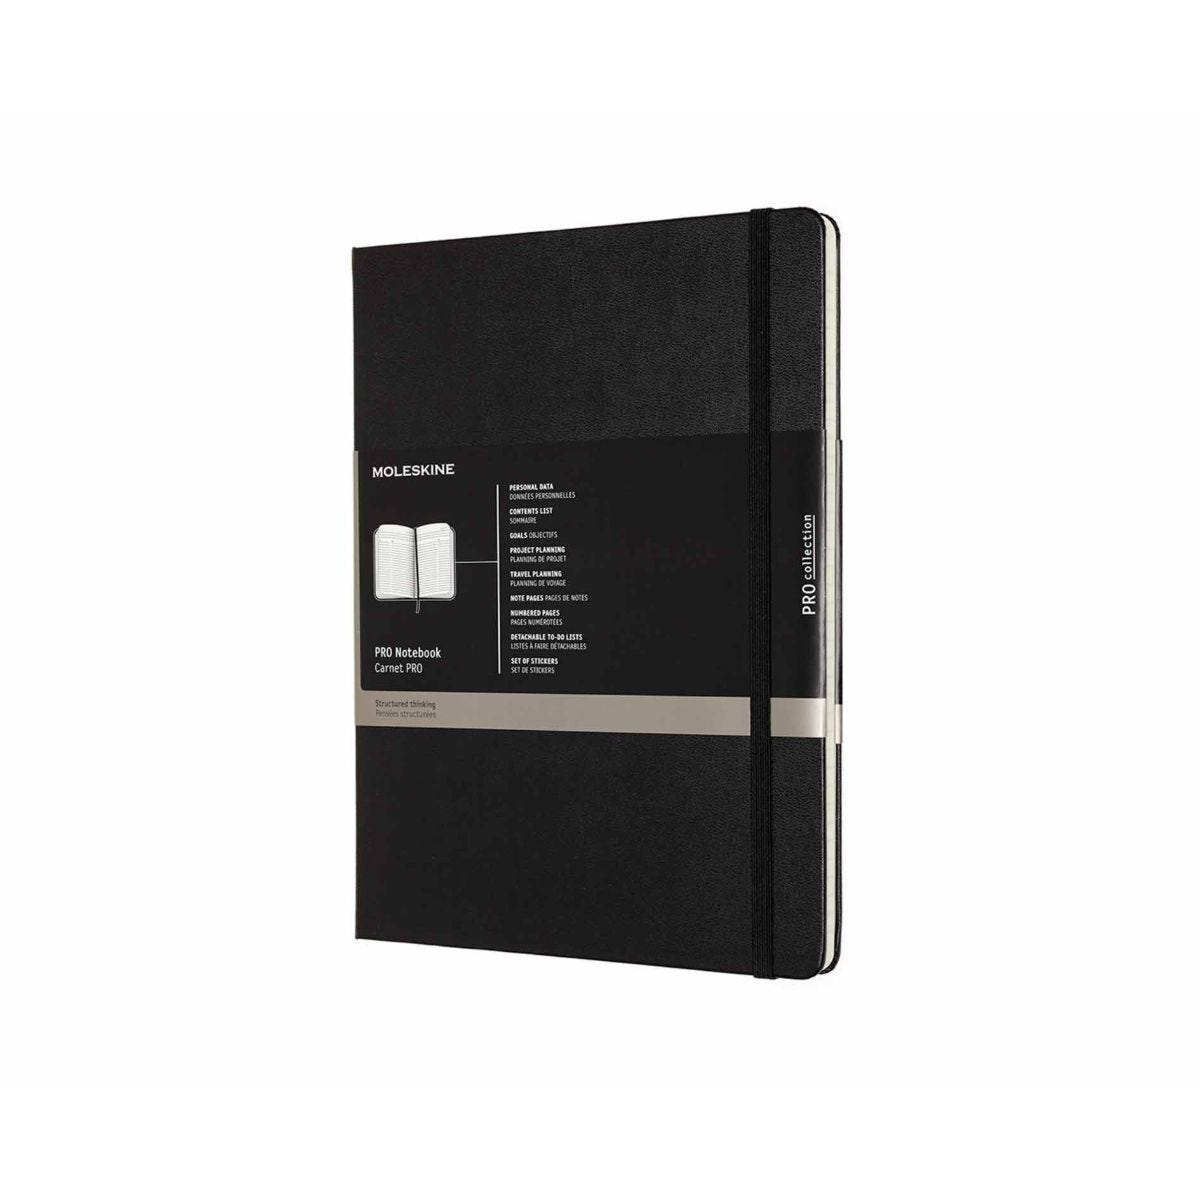 Moleskine Professional Notebook Hard Cover Extra Large